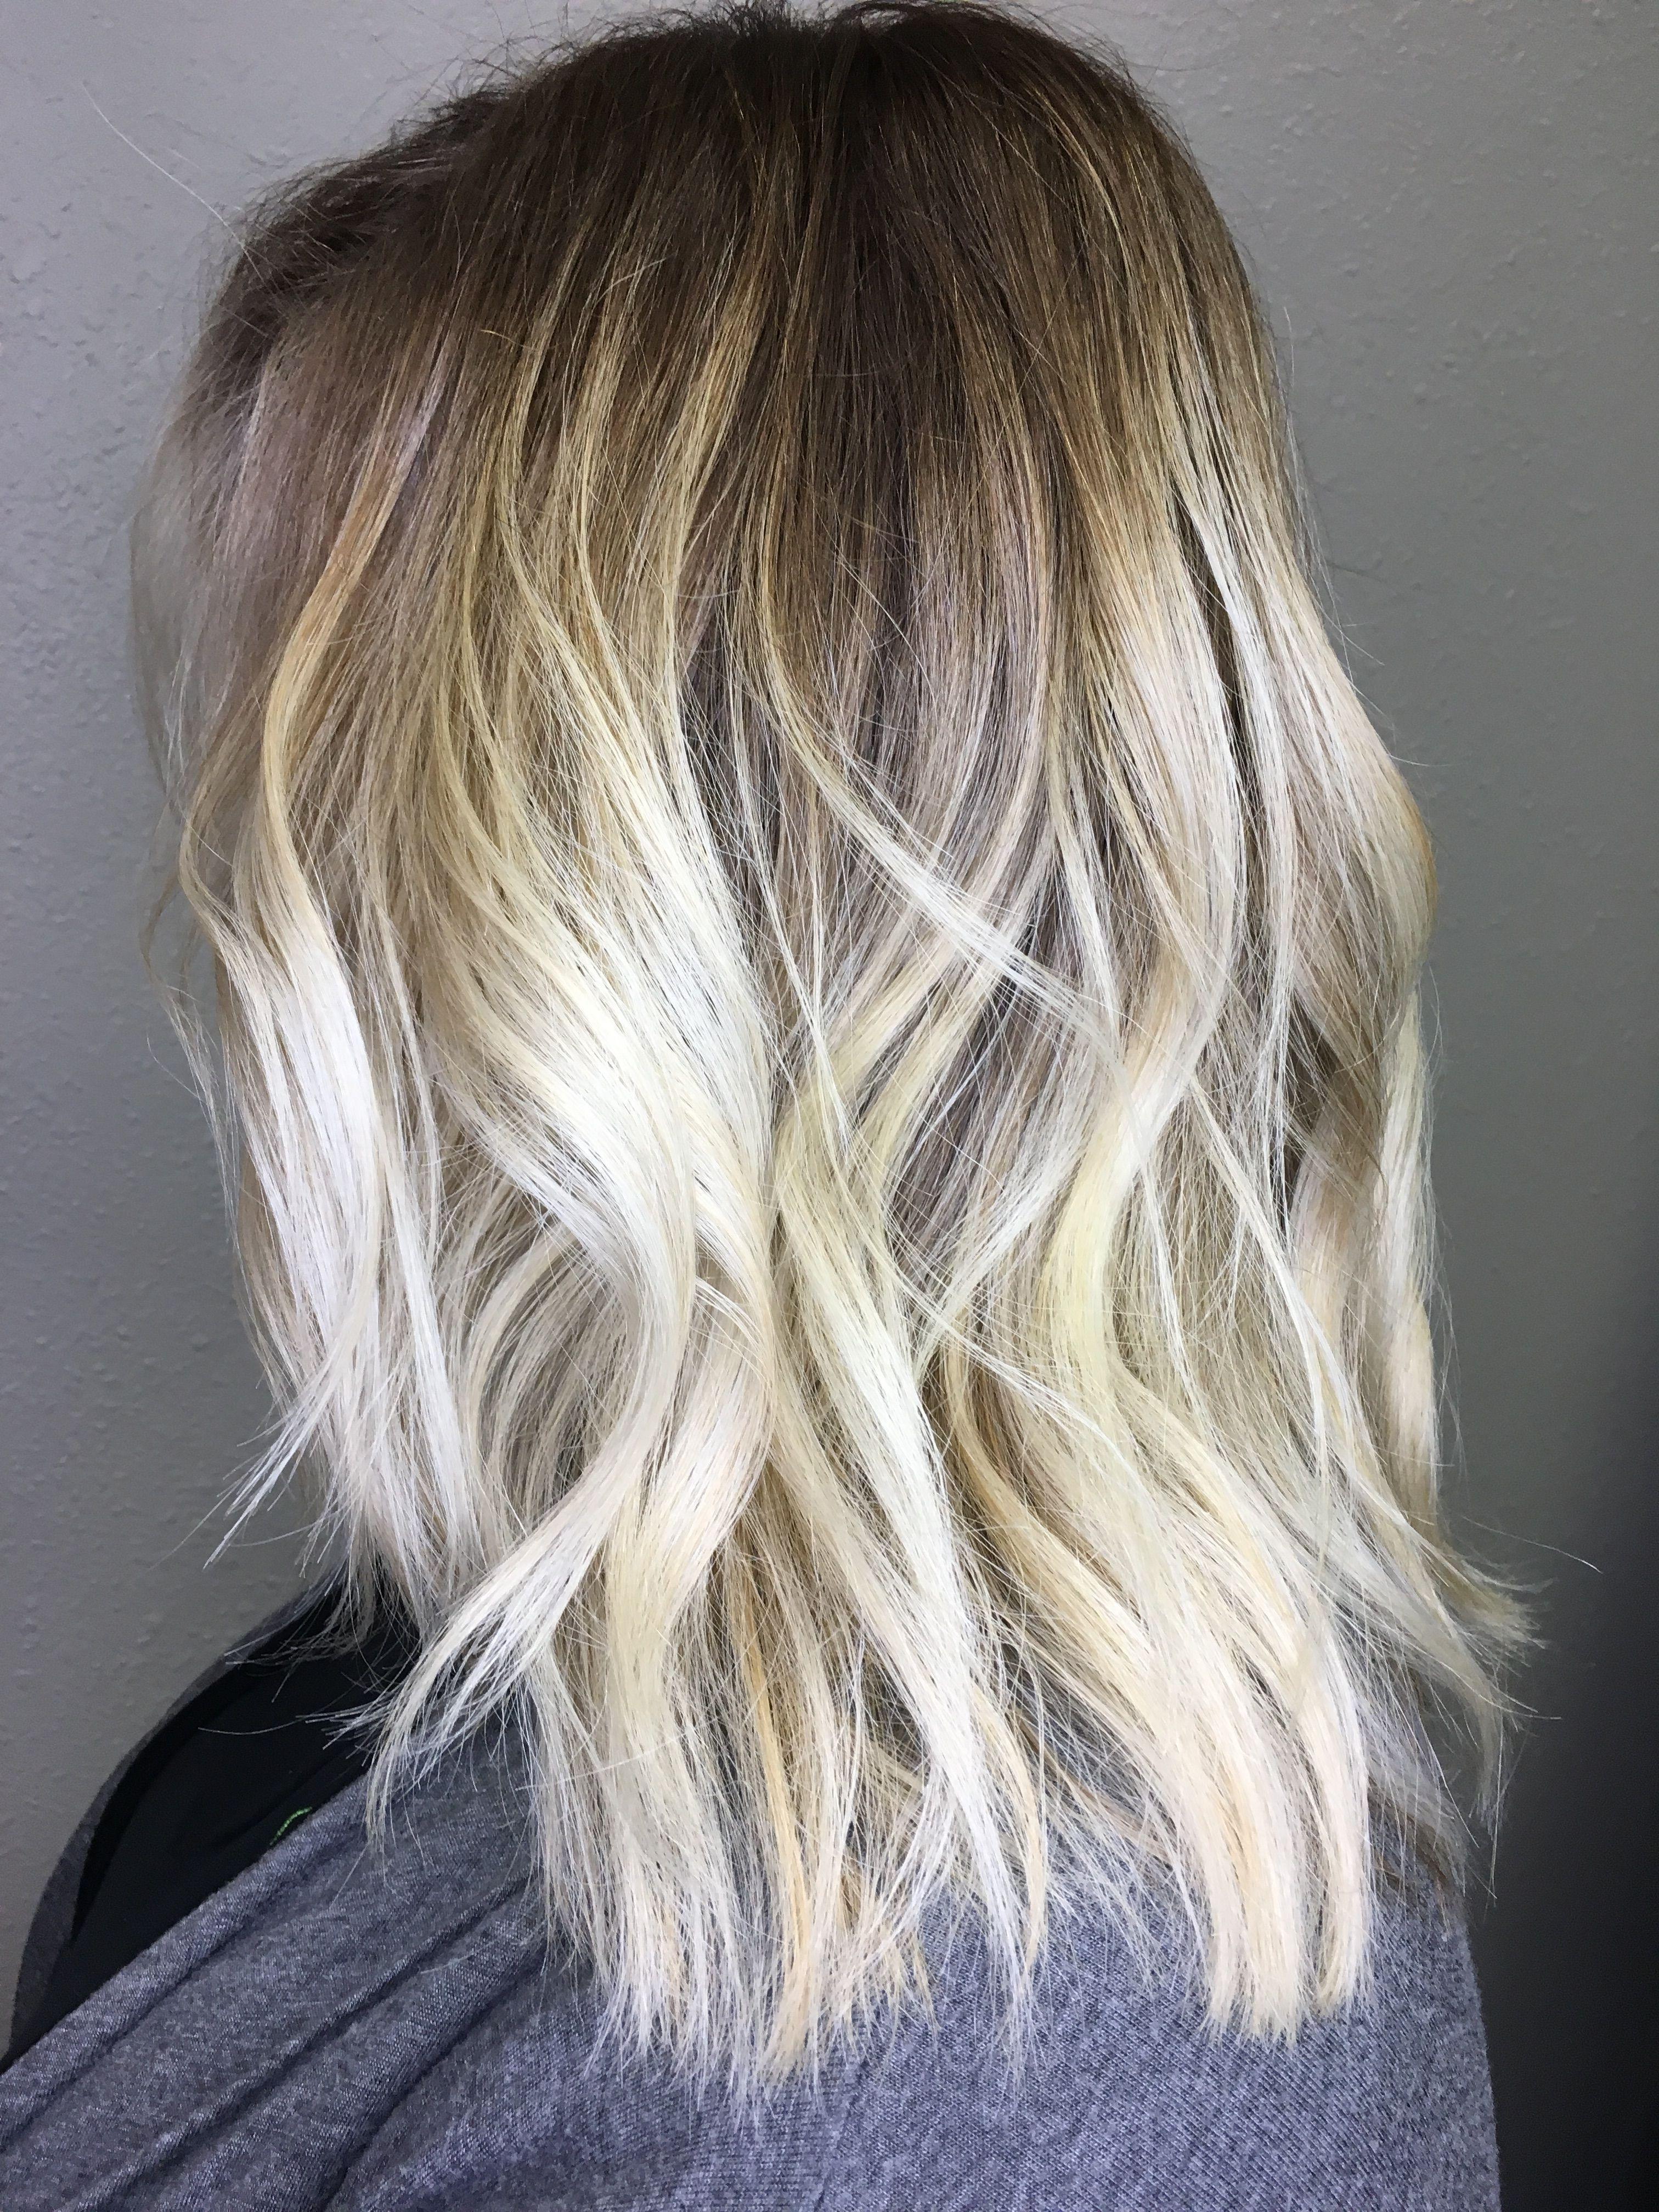 Blonde Balayage Dark Roots With Bleach Blonde Ends Medium Length Hair Beach Waves Balayage Hair Blonde Medium Dark Roots Blonde Hair Blonde Balayage